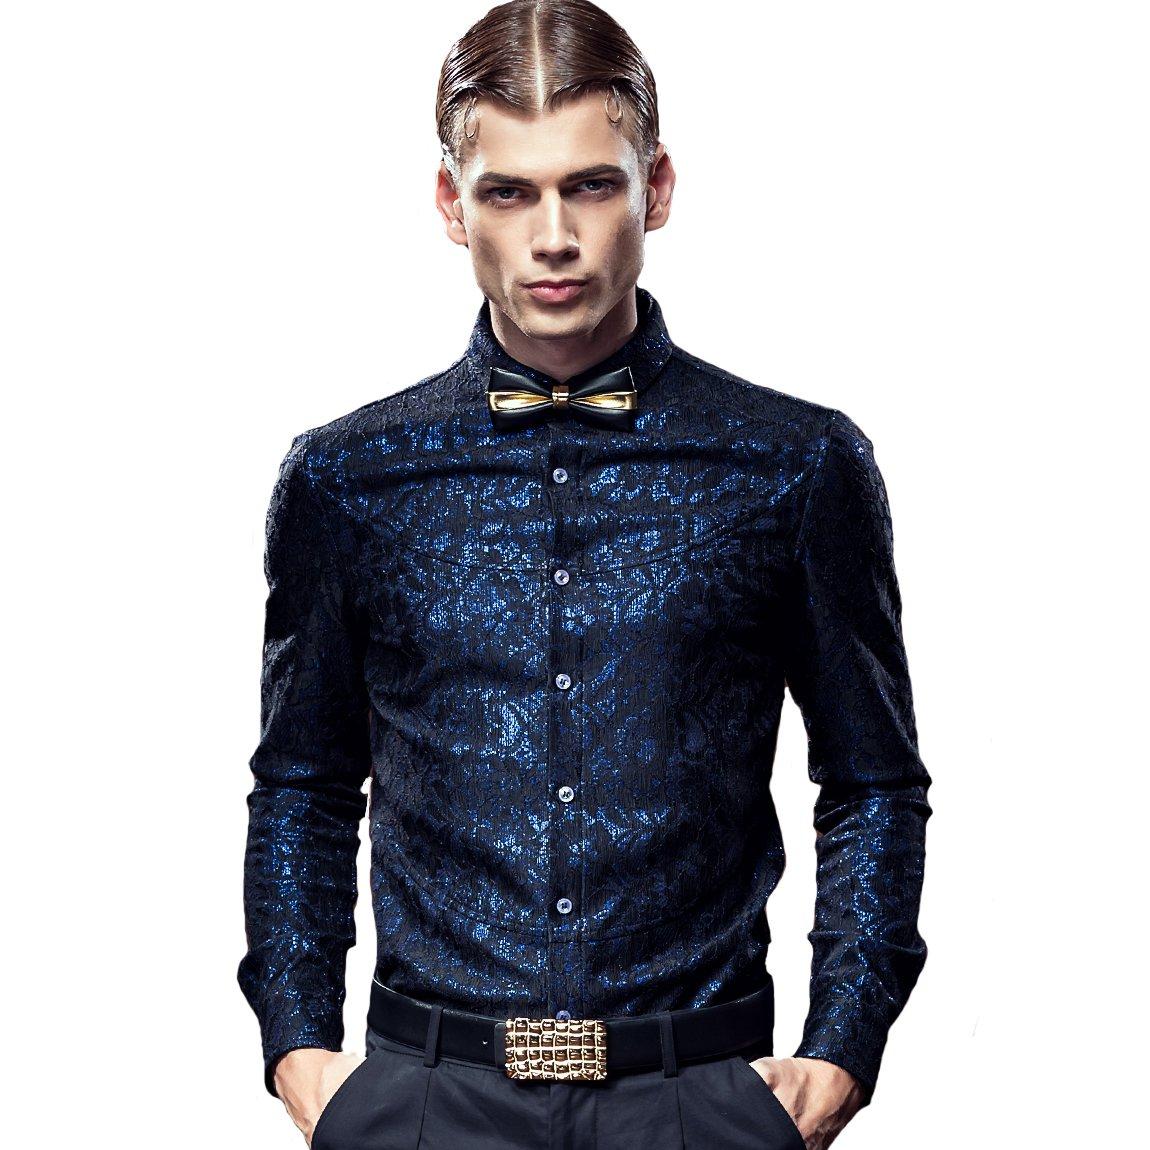 FANZHUAN Shirt Slim Fit No Stiro Camicia Uomo Elegante Maniche Lunghe Casual Lusso 612106